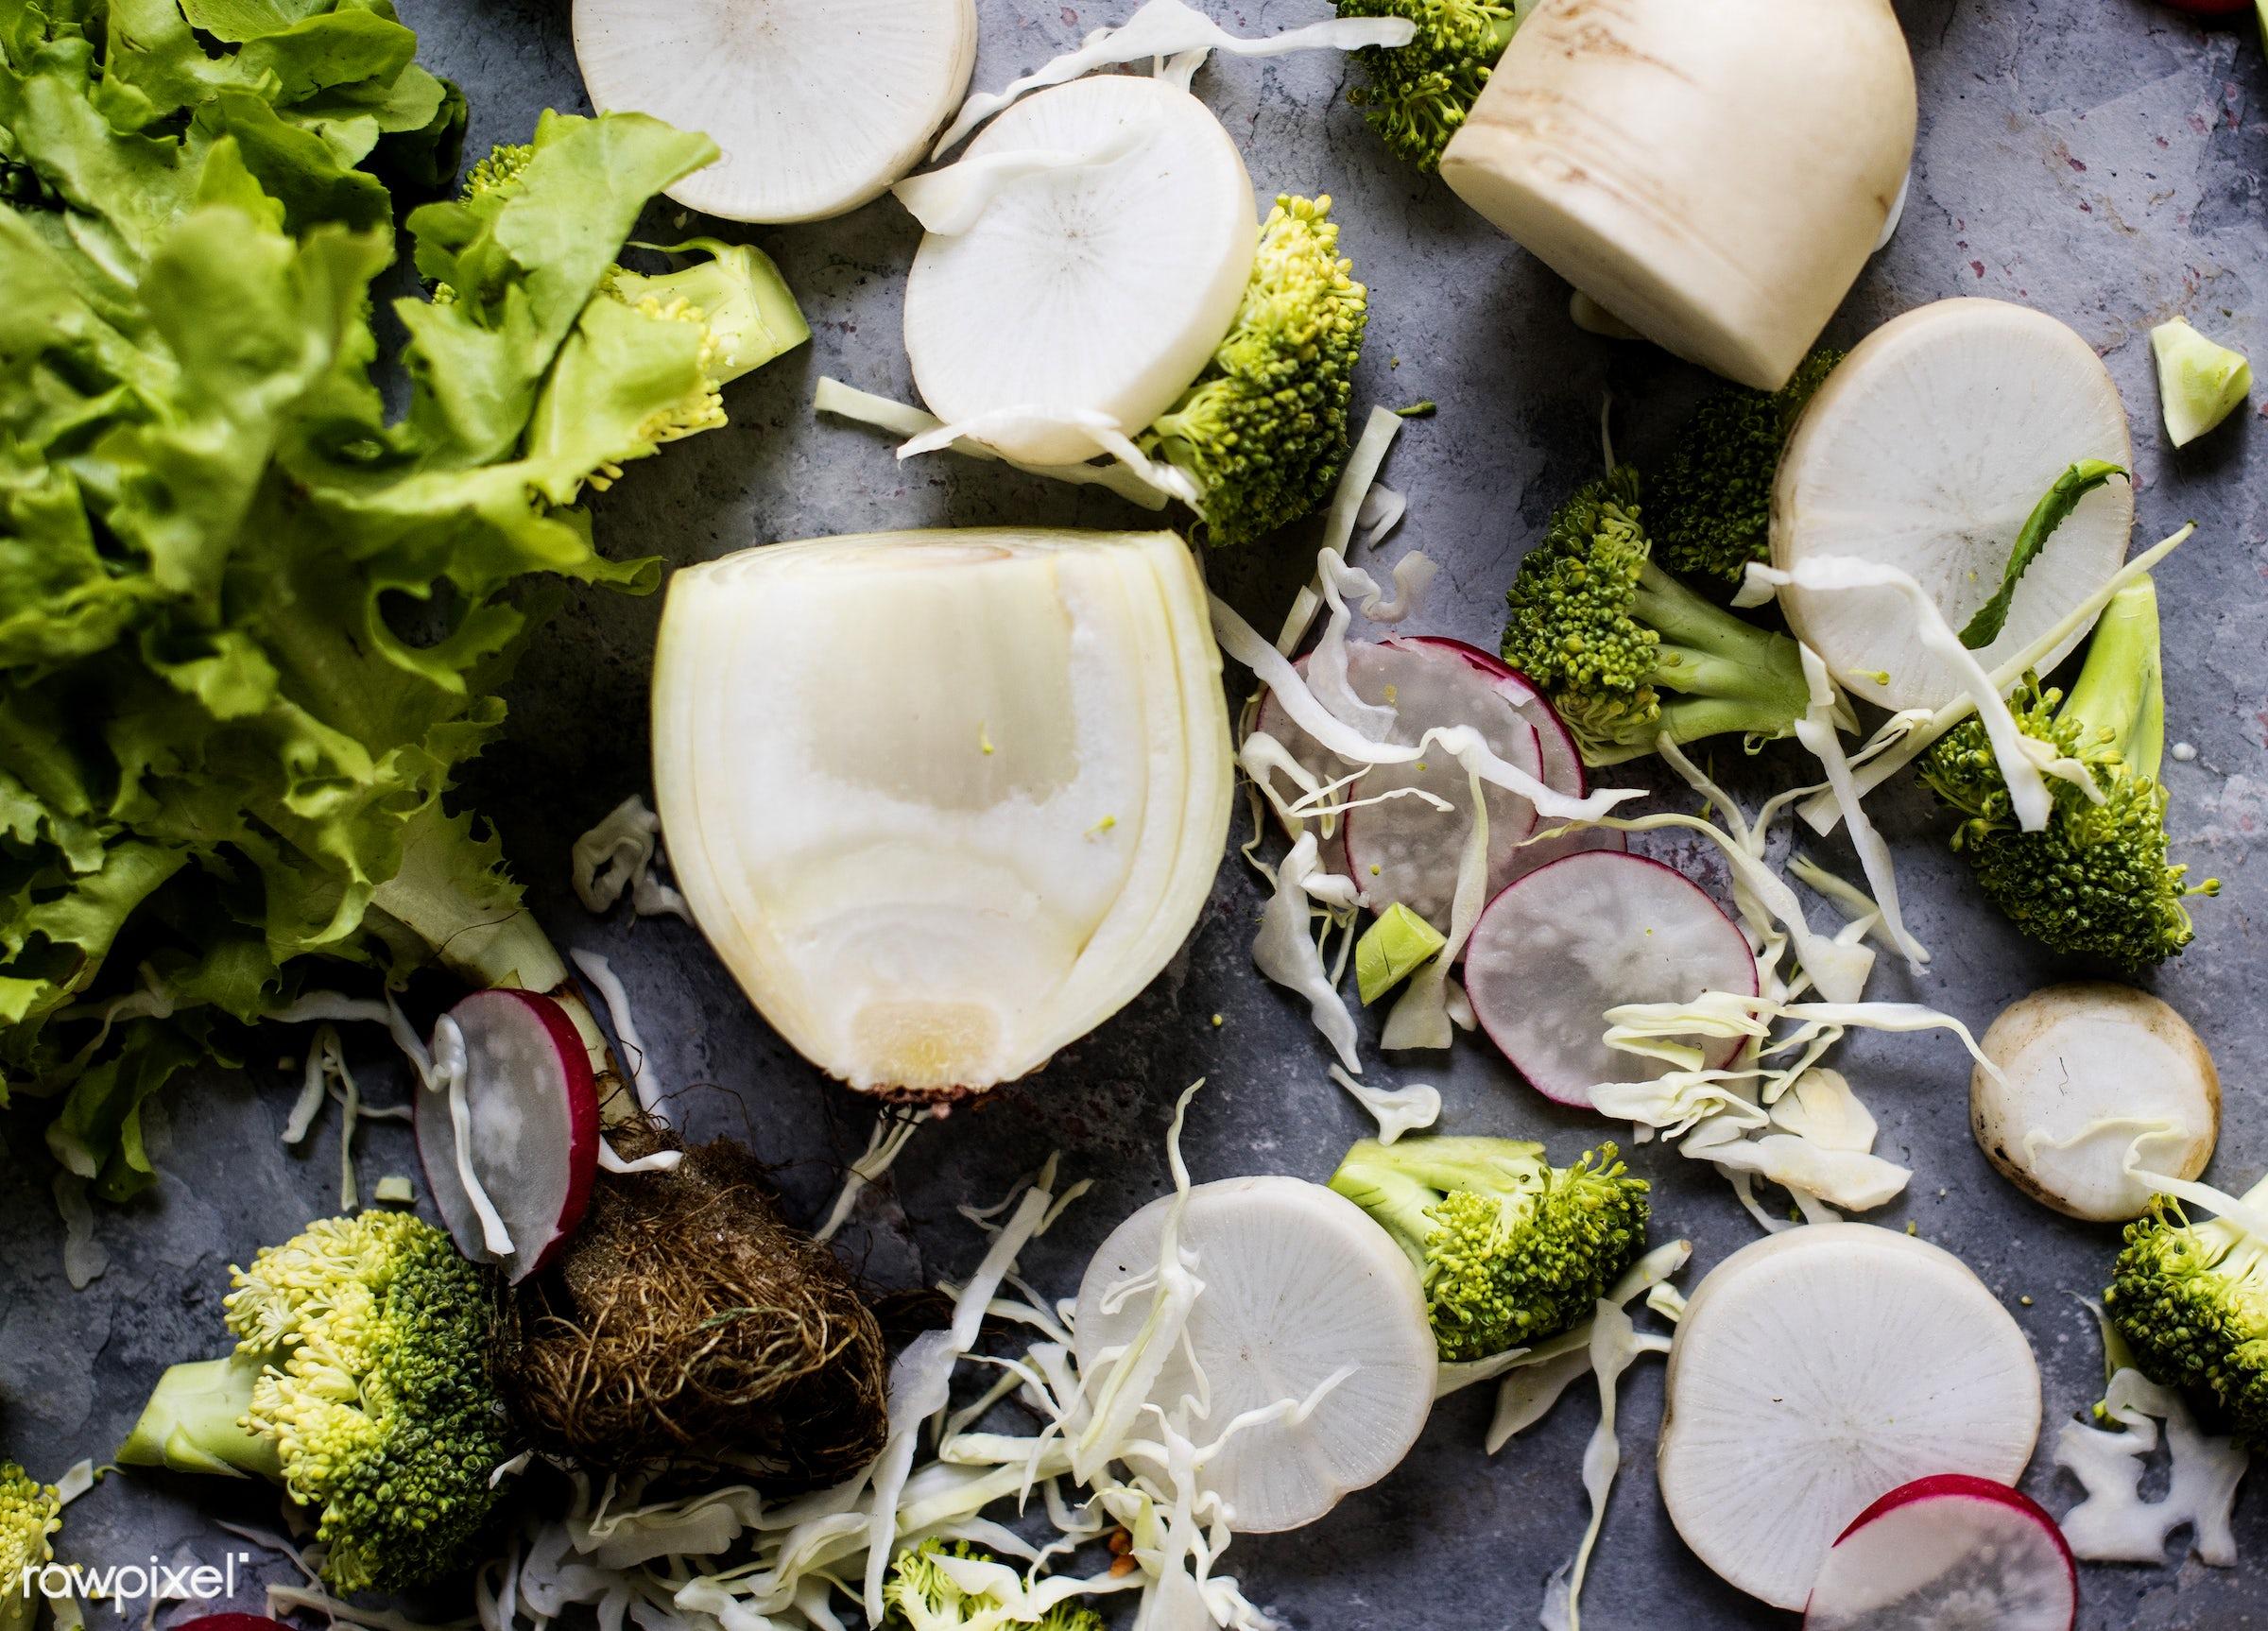 raw, turnips, gastronomy, fresh, vegetarian, cooking, ingredient, gourmet, nourishment, vegetables, culinary, veggies,...